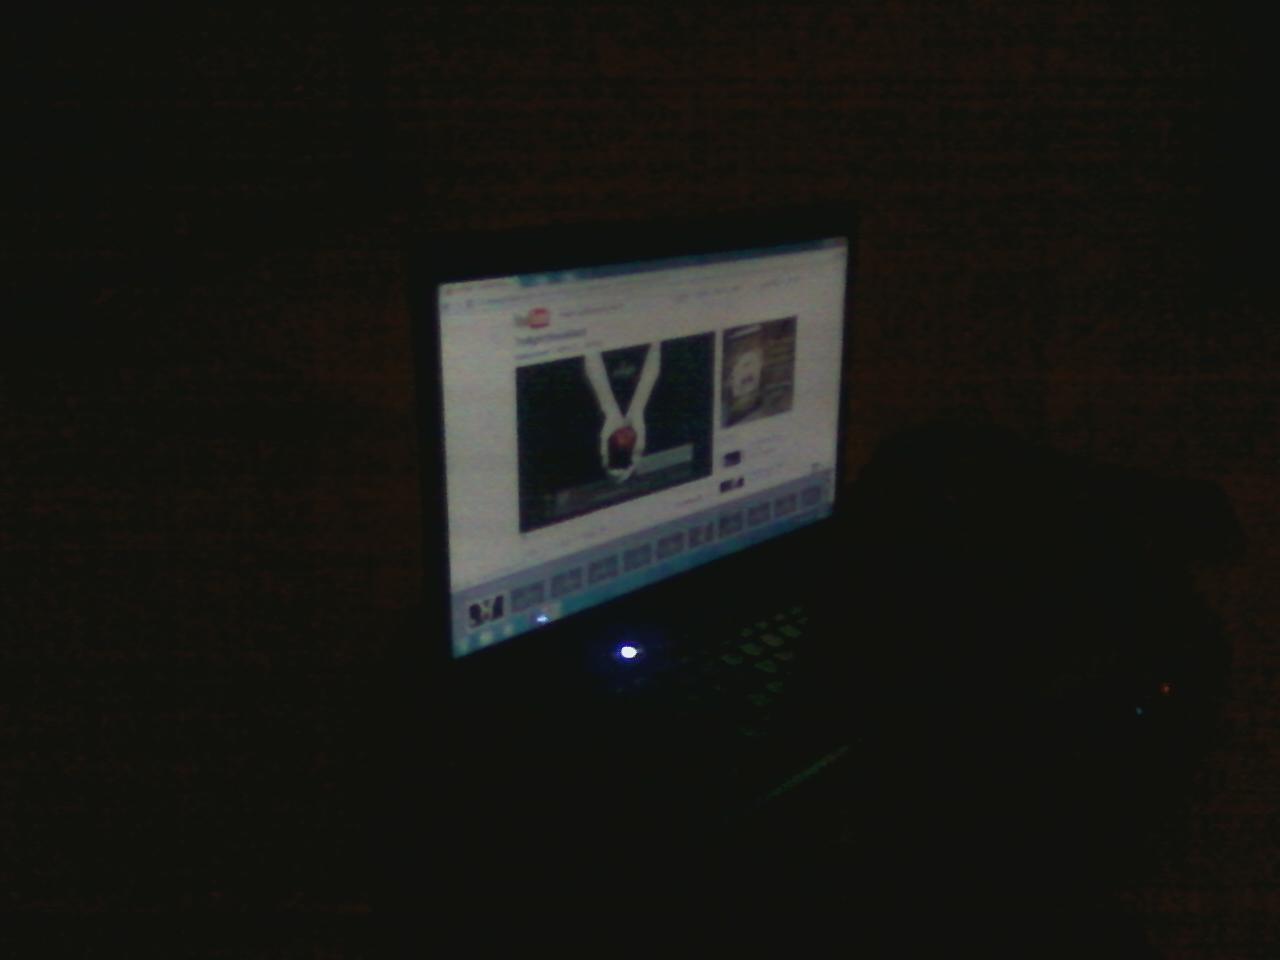 http://1.bp.blogspot.com/-_TTjpapujak/TevY26nVvQI/AAAAAAAAAMs/DDhDdzjeUrg/s1600/Laptop.jpg